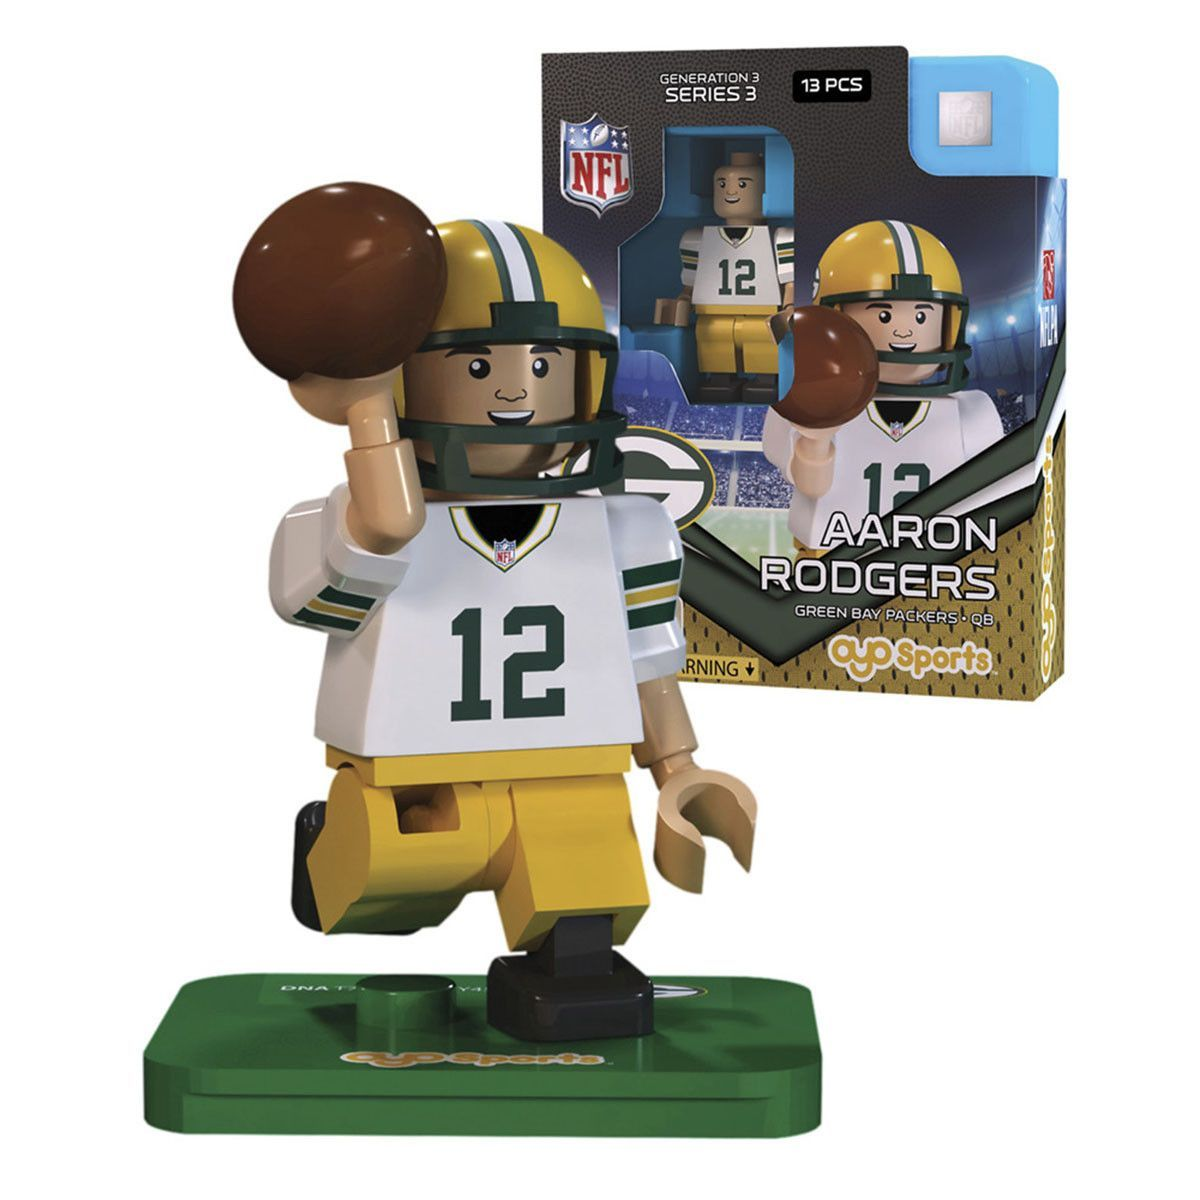 Nfl Green Bay Packers Aaron Rodgers G3s3 Oyo Mini Figure Oyo Nfl Detroit Lions